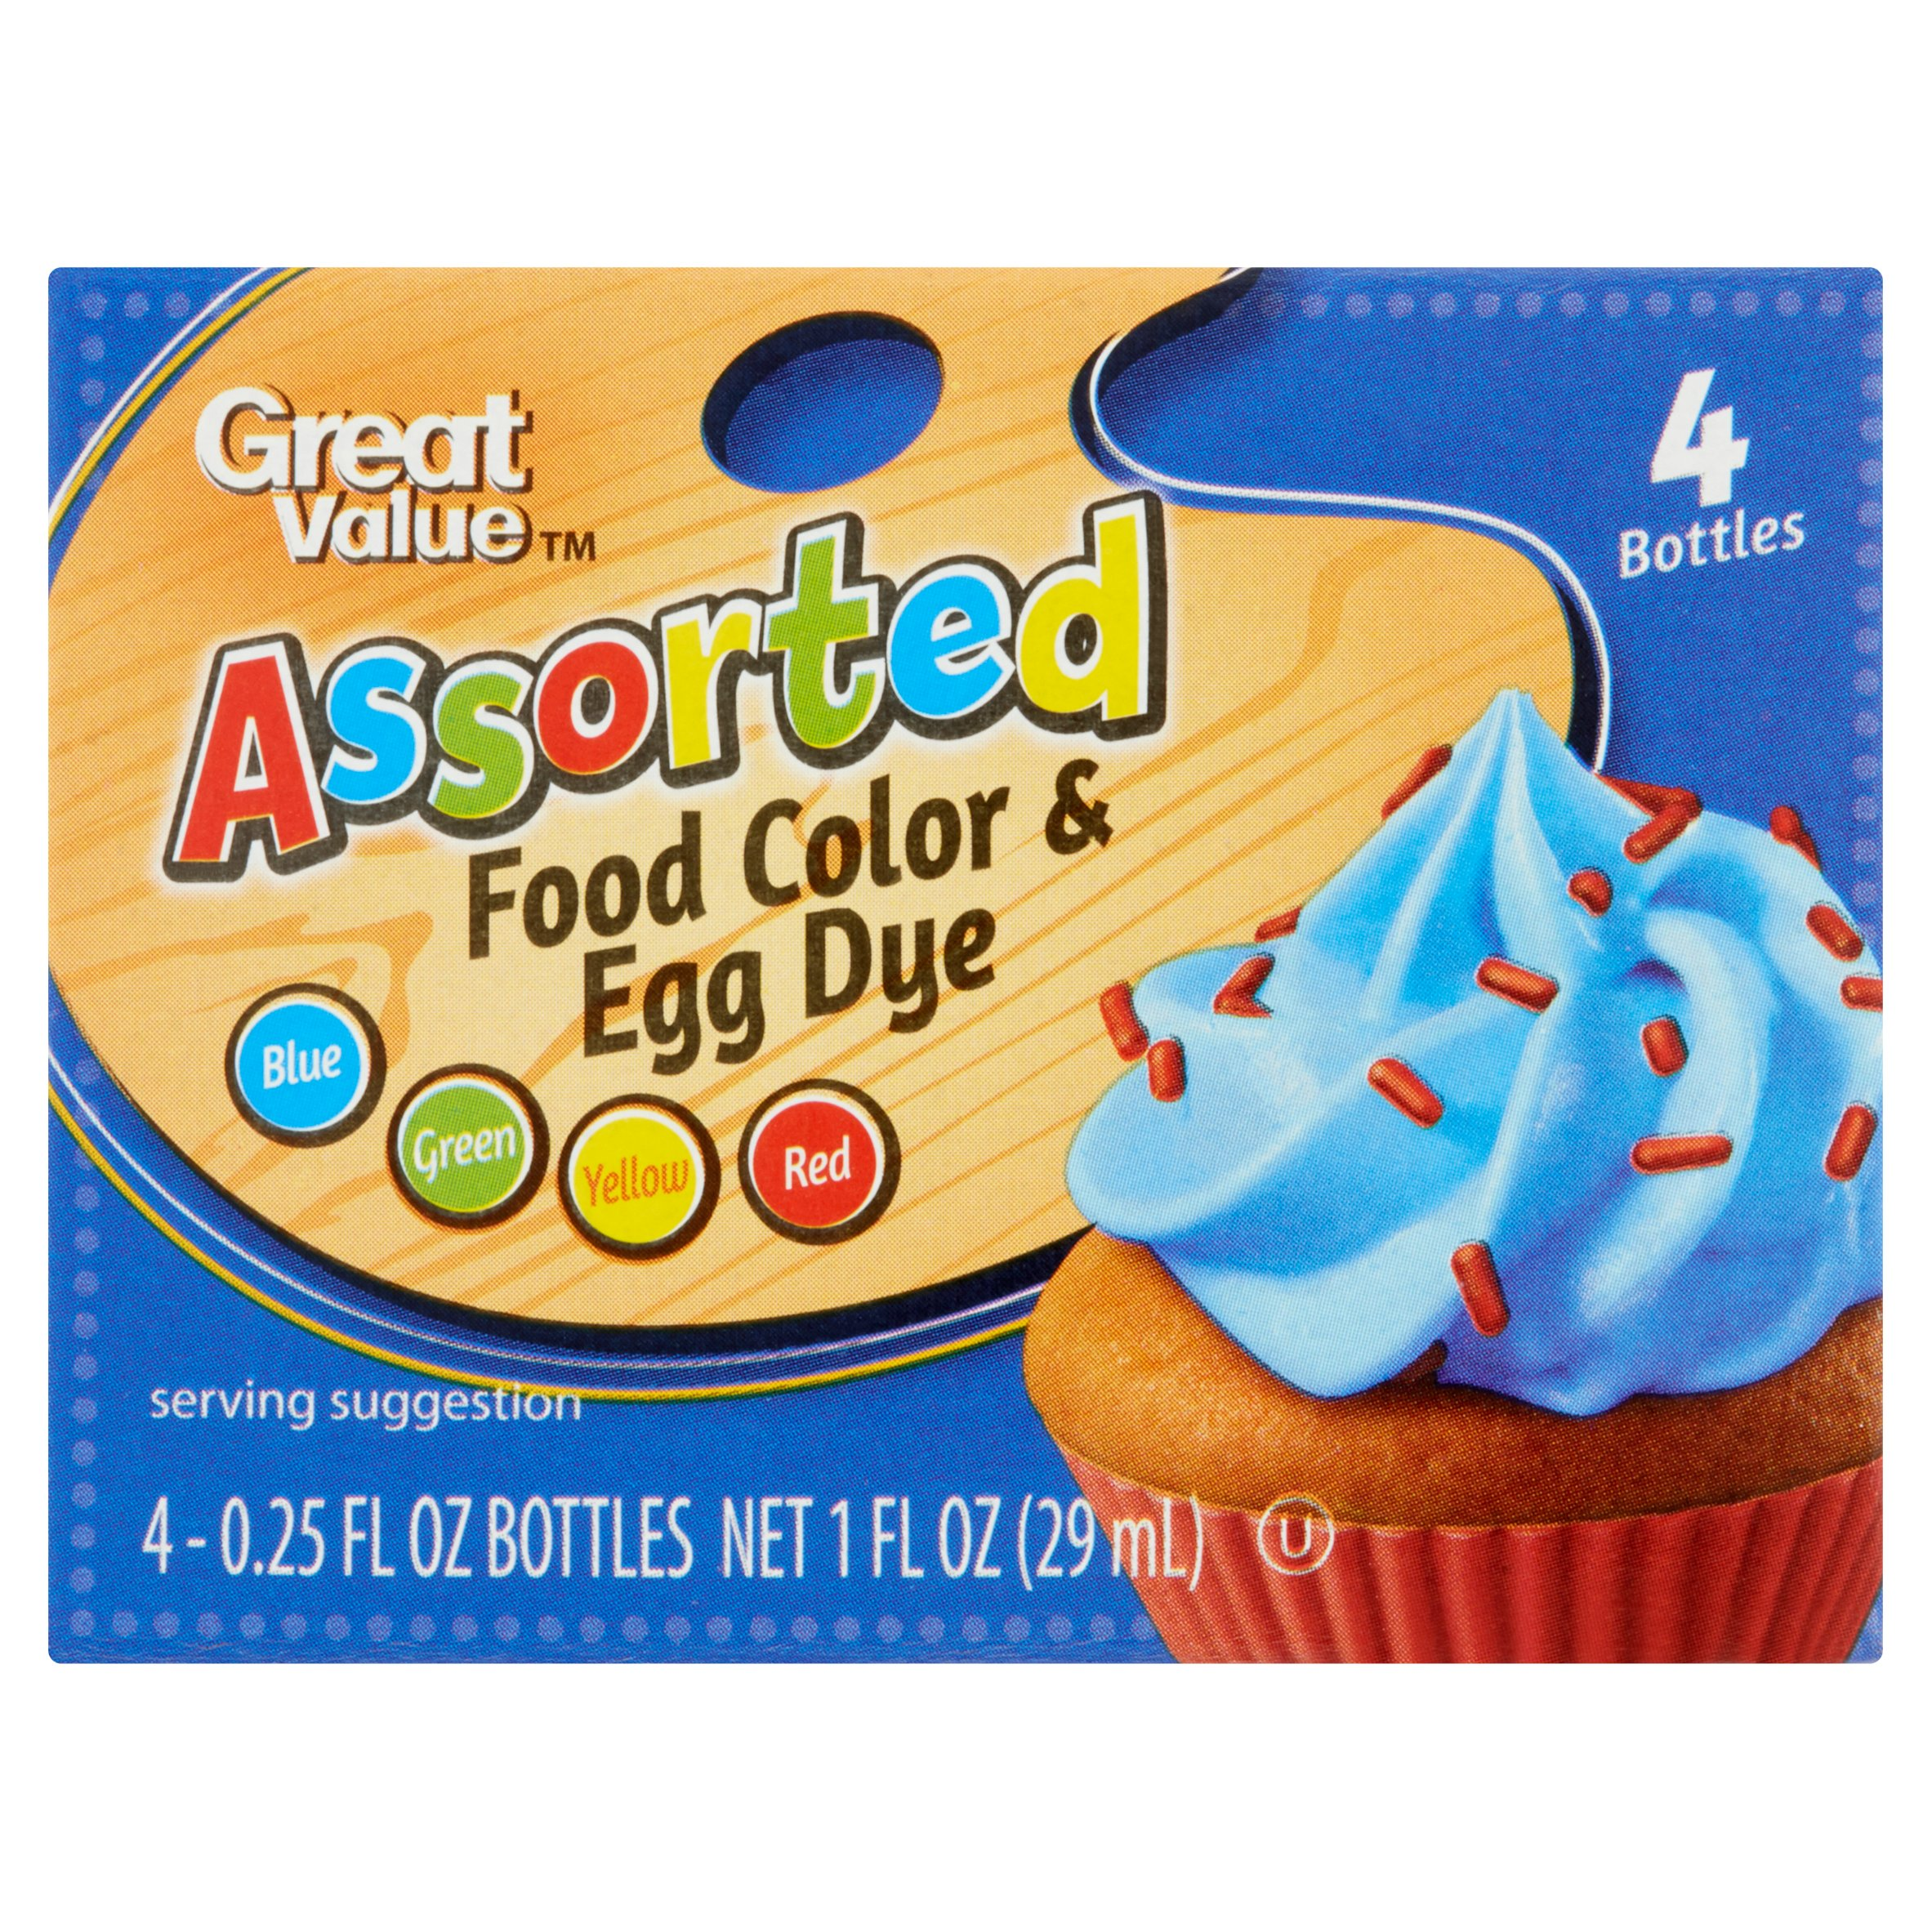 (2 pack) Great Value Assorted Food Color & Egg Dye, 0.25 fl oz, 4 count